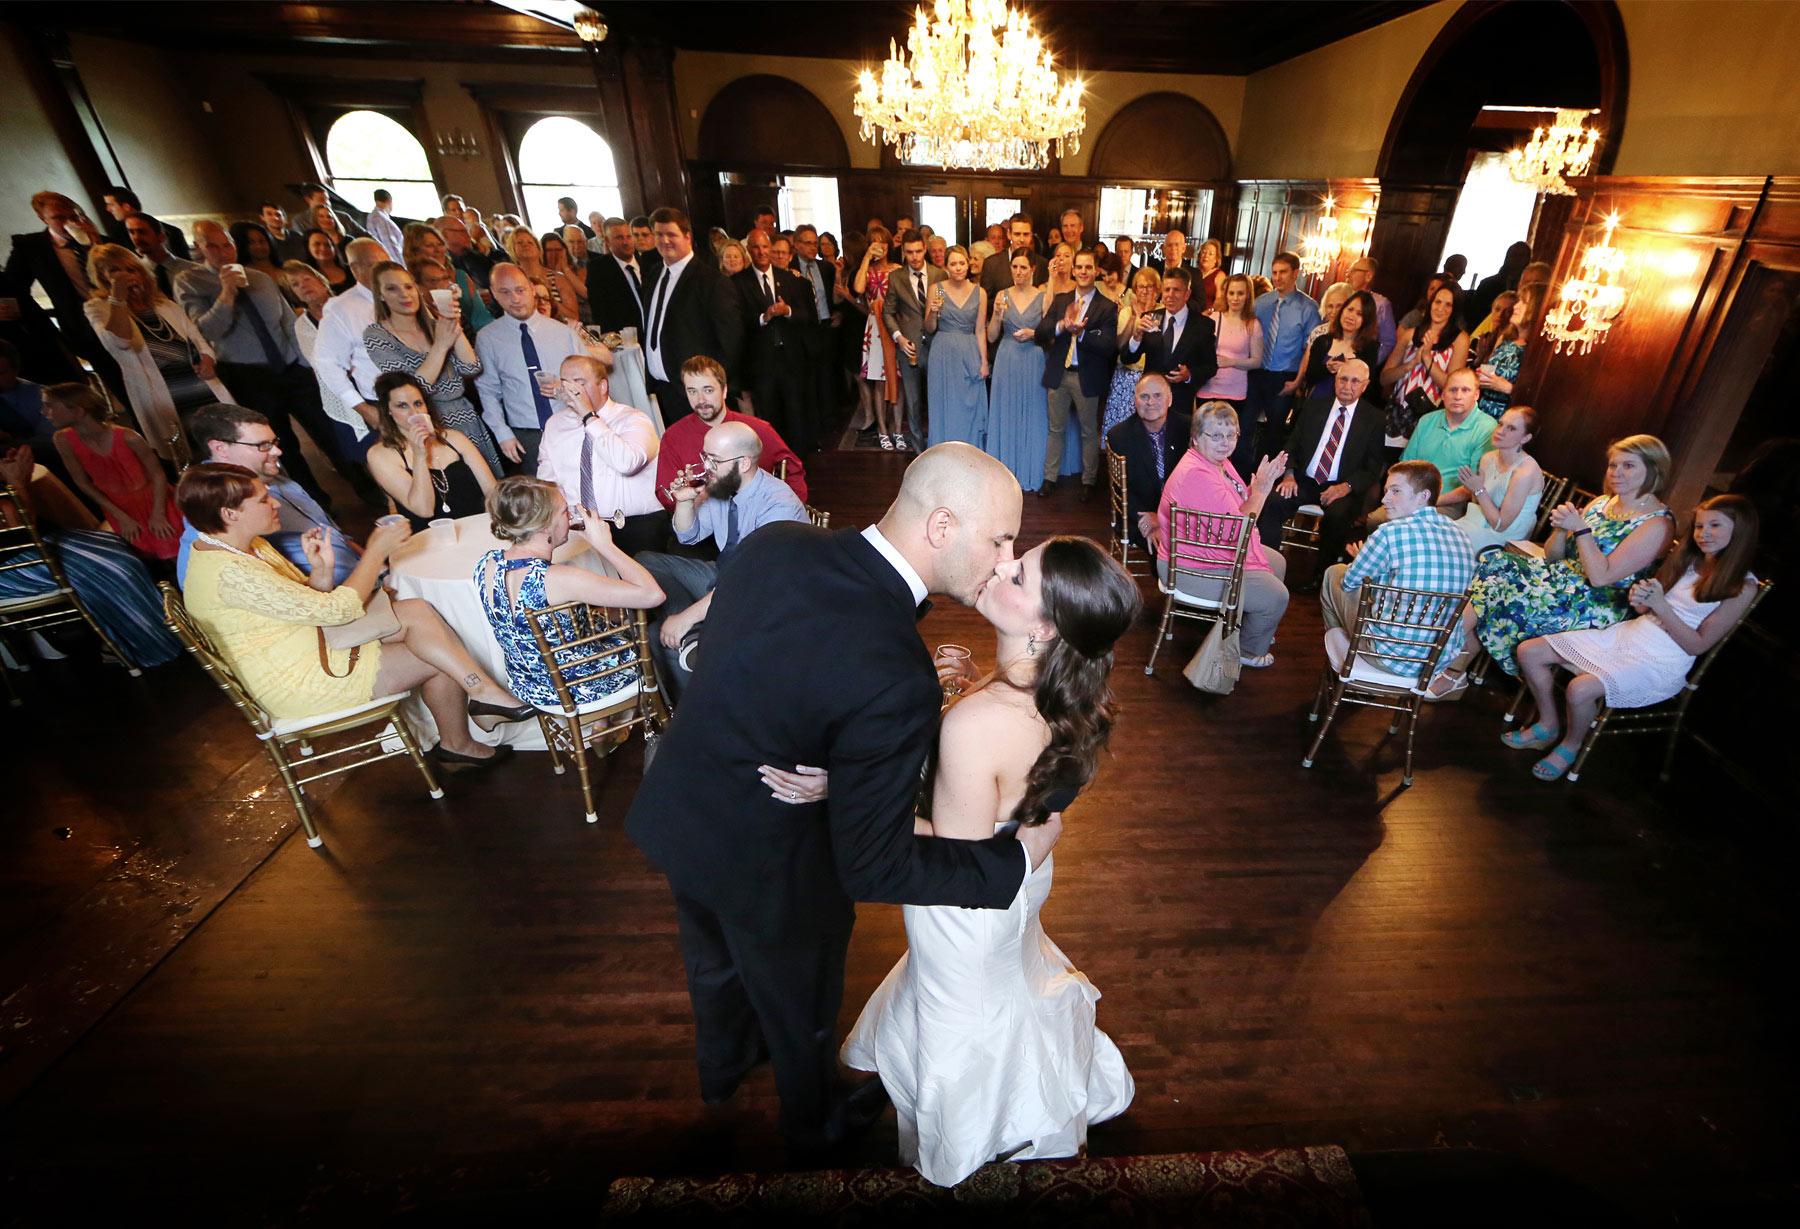 16-Minneapolis-Minnesota-Wedding-Photography-by-Vick-Photography-Semple-Mansion-Reception-Speeches-Nikki-and-Matt.jpg